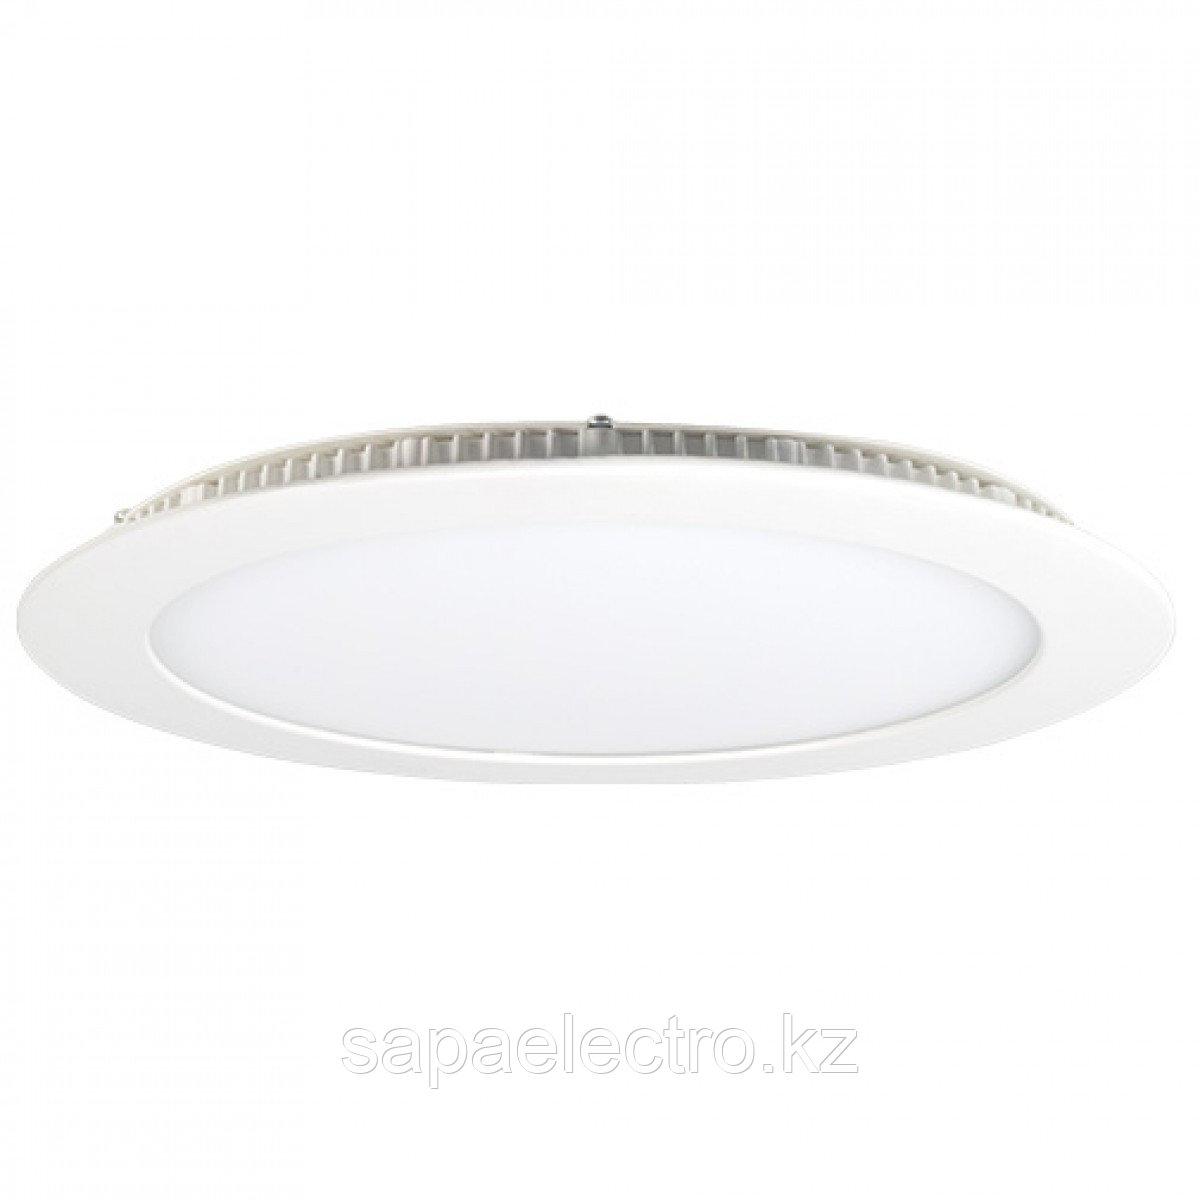 Свет-к DL LED ROUND PANEL 24W 6000K (TS) 20шт